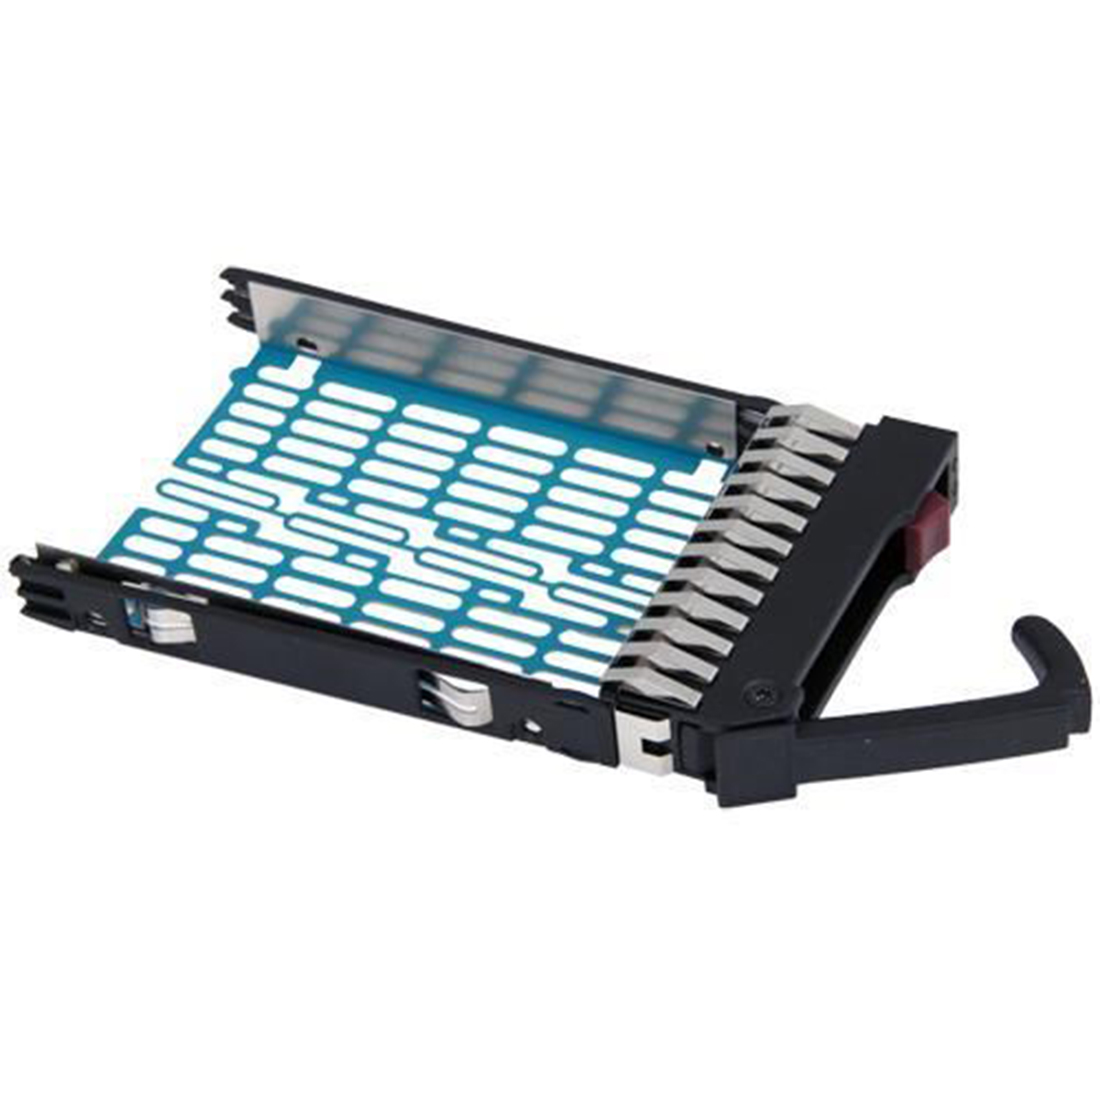 NOYOKERE 2.5 Inch SATA HDD Hard Drive Tray Caddy Bracket For HP ...